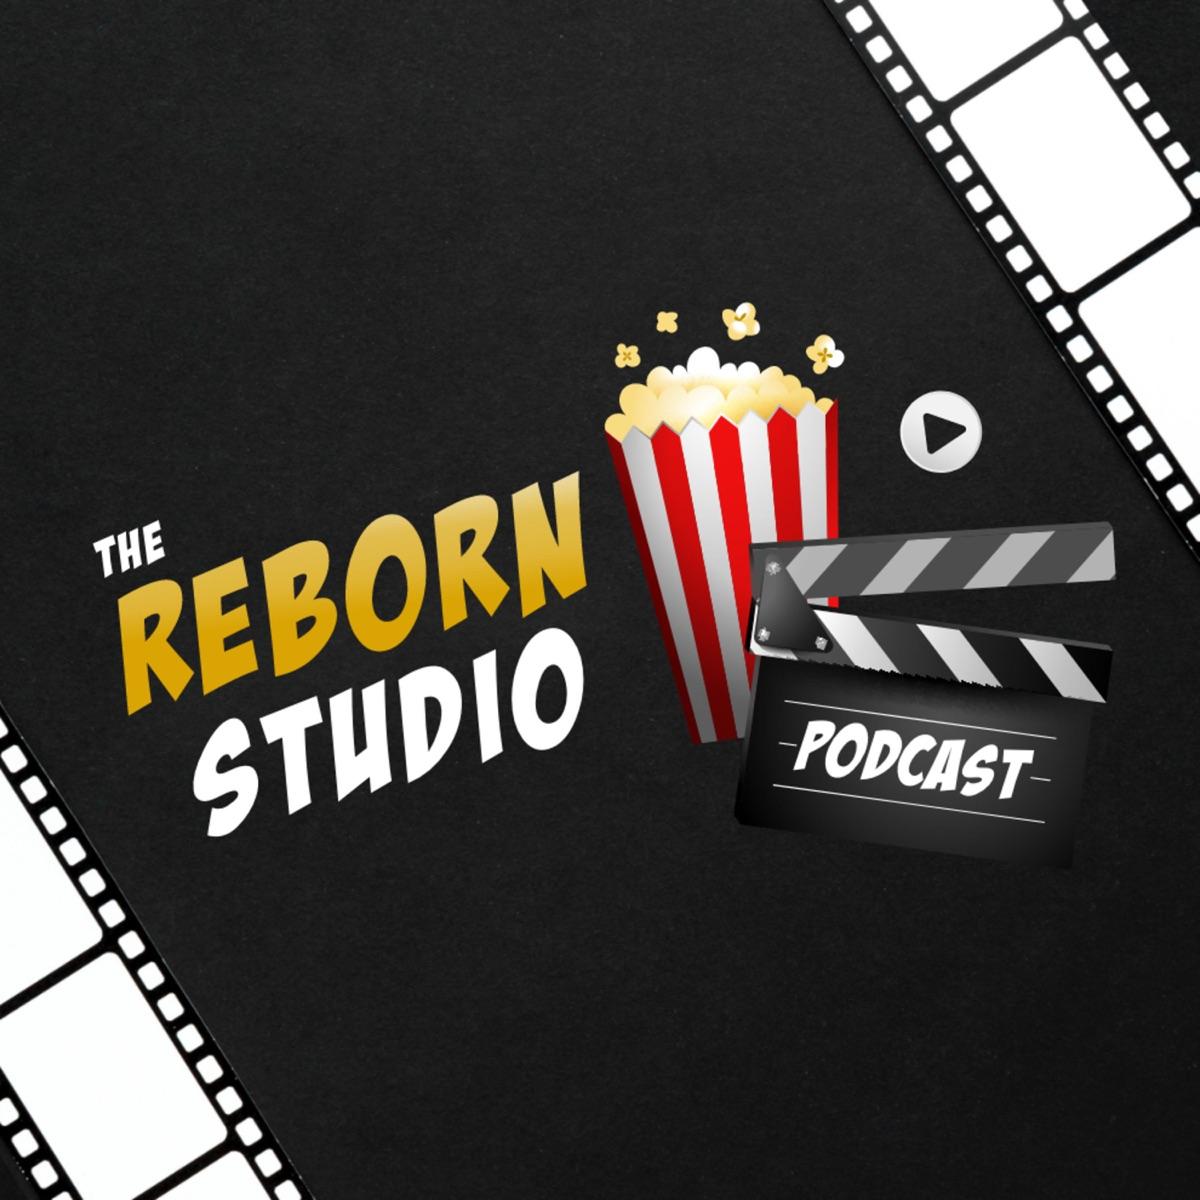 The Reborn Studio Podcast